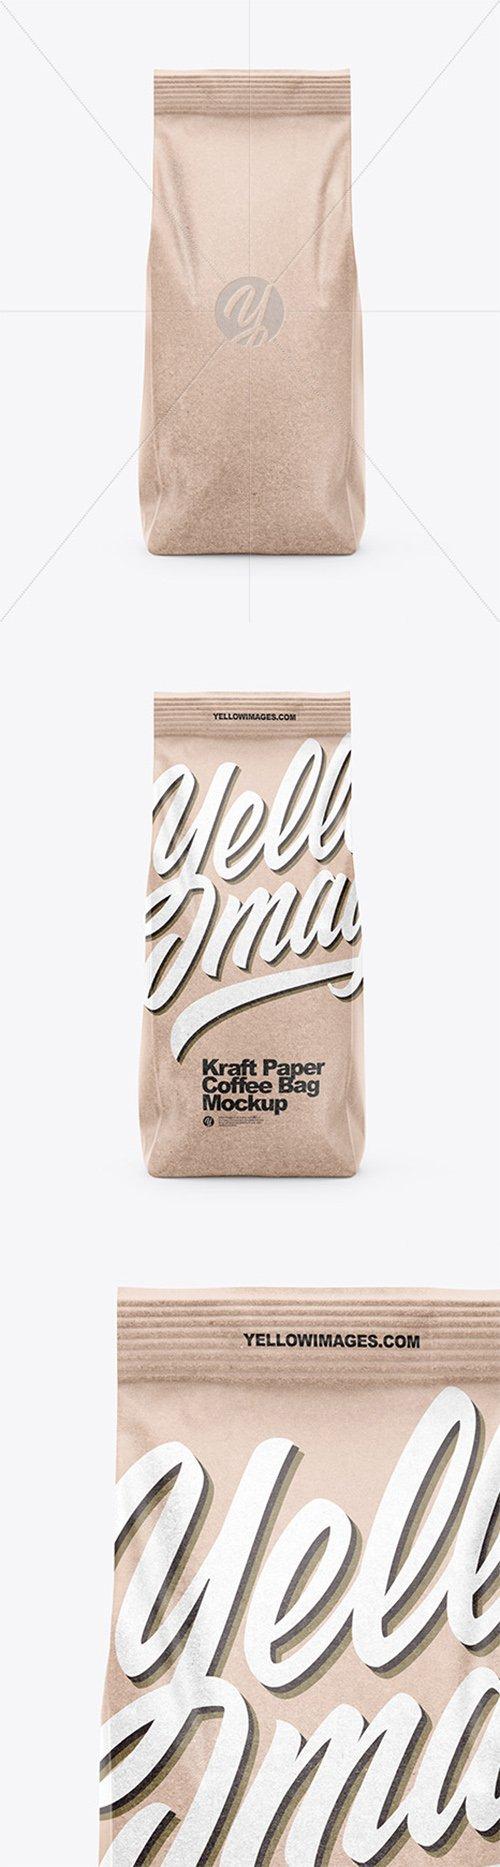 Kraft Coffee Bag Mockup - Front View 66603 TIF